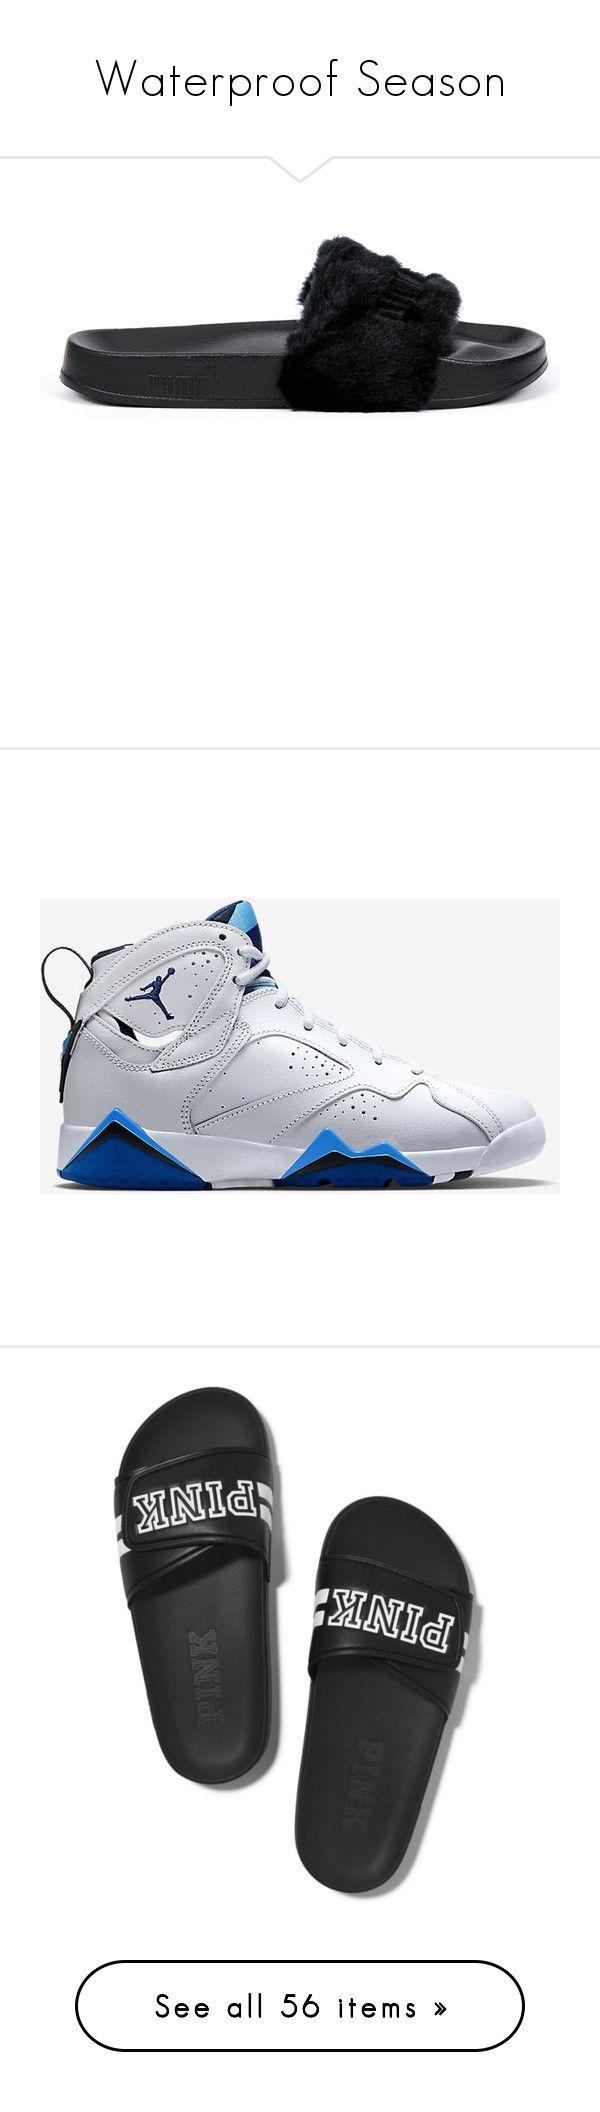 """Waterproof Season"" by bigdaddycam43 ❤ liked on Polyvore featuring shoes, sandals, black, black shoes, puma shoes, fur shoes, kohl shoes, puma footwear, jordan 7 and blue"